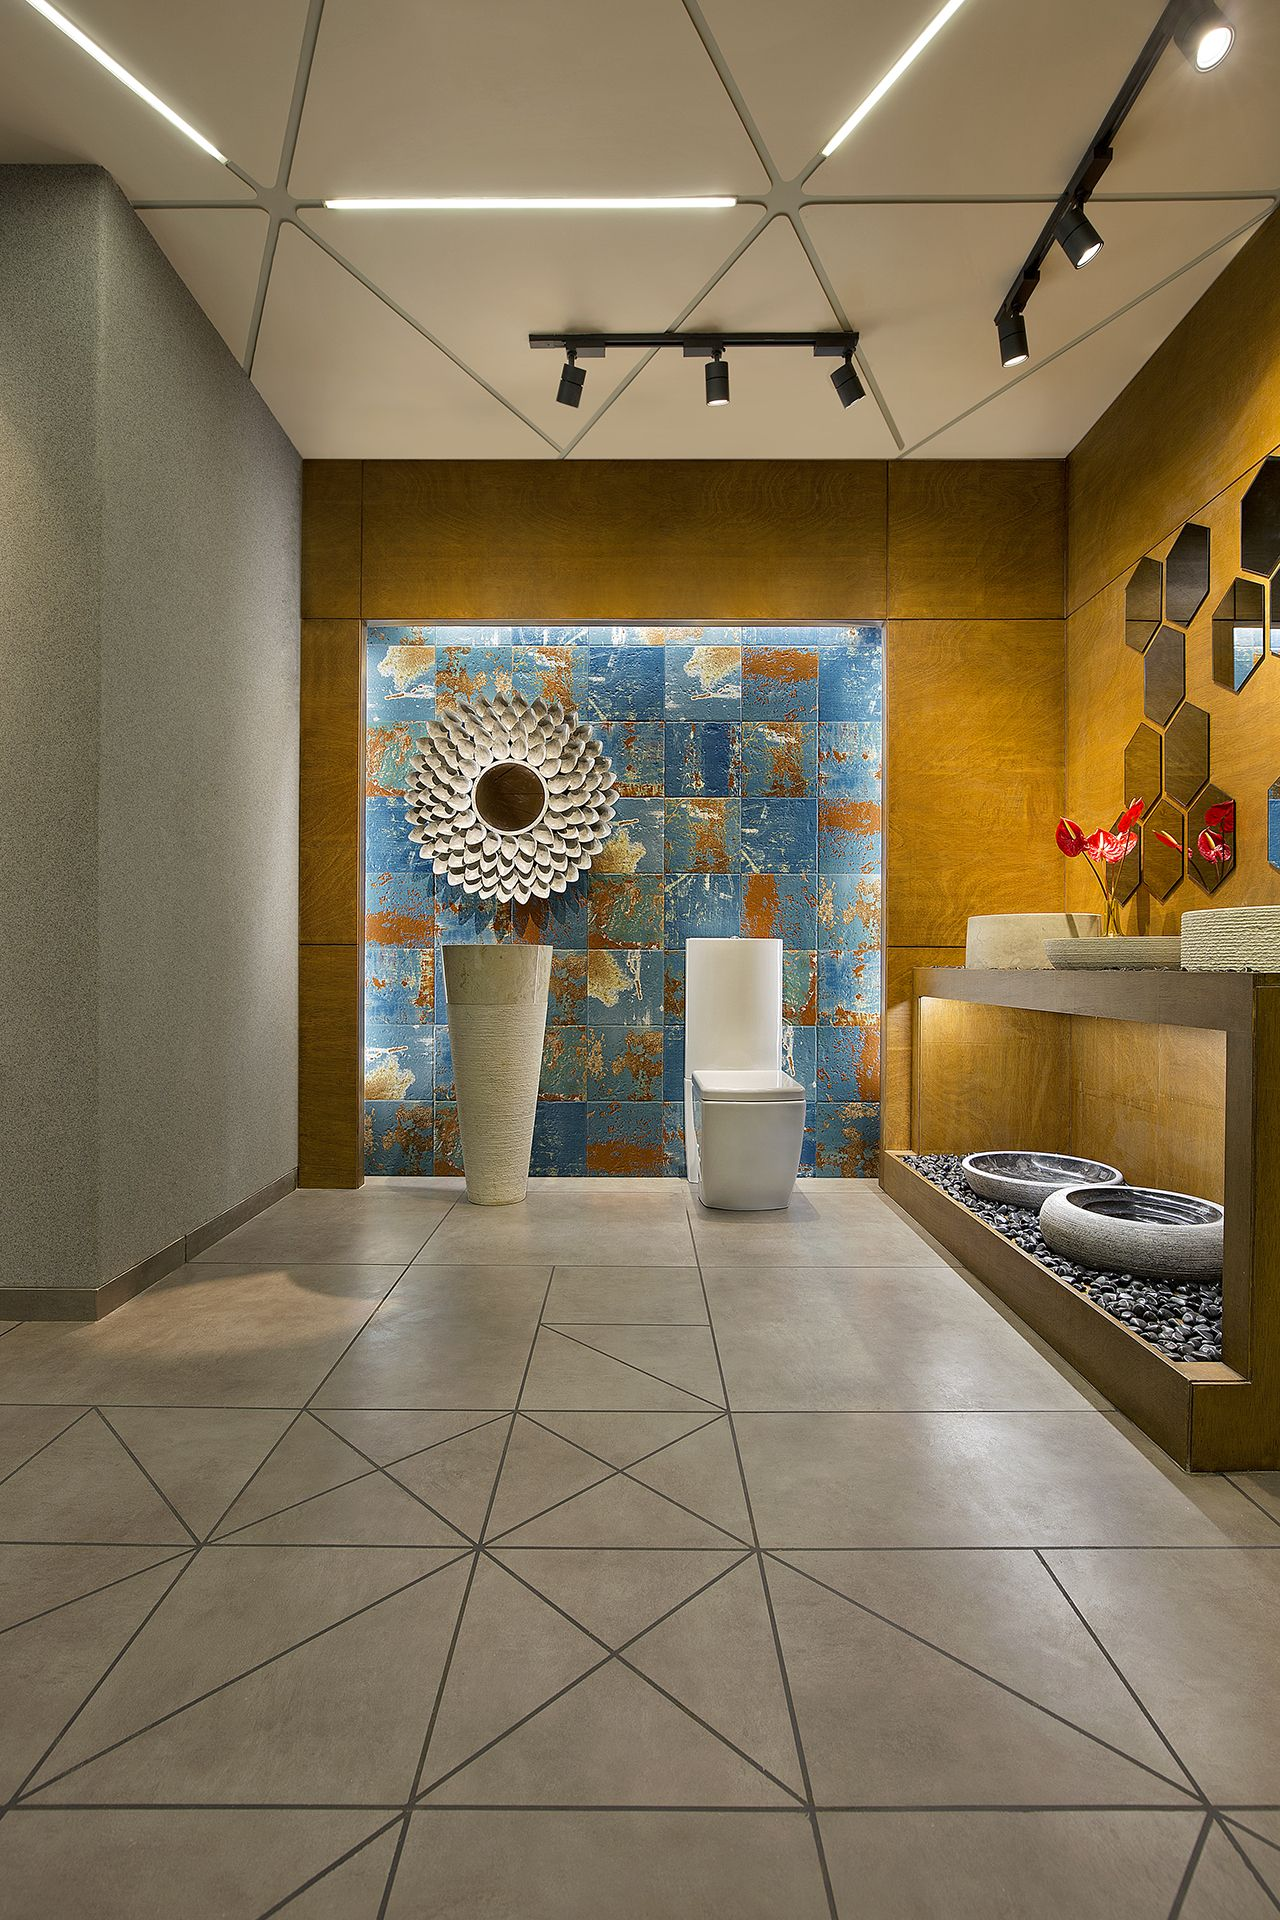 The ceramic shoppe    associates also mr kashyap pkadia  bhk house interiors design pune by trendy rh pinterest